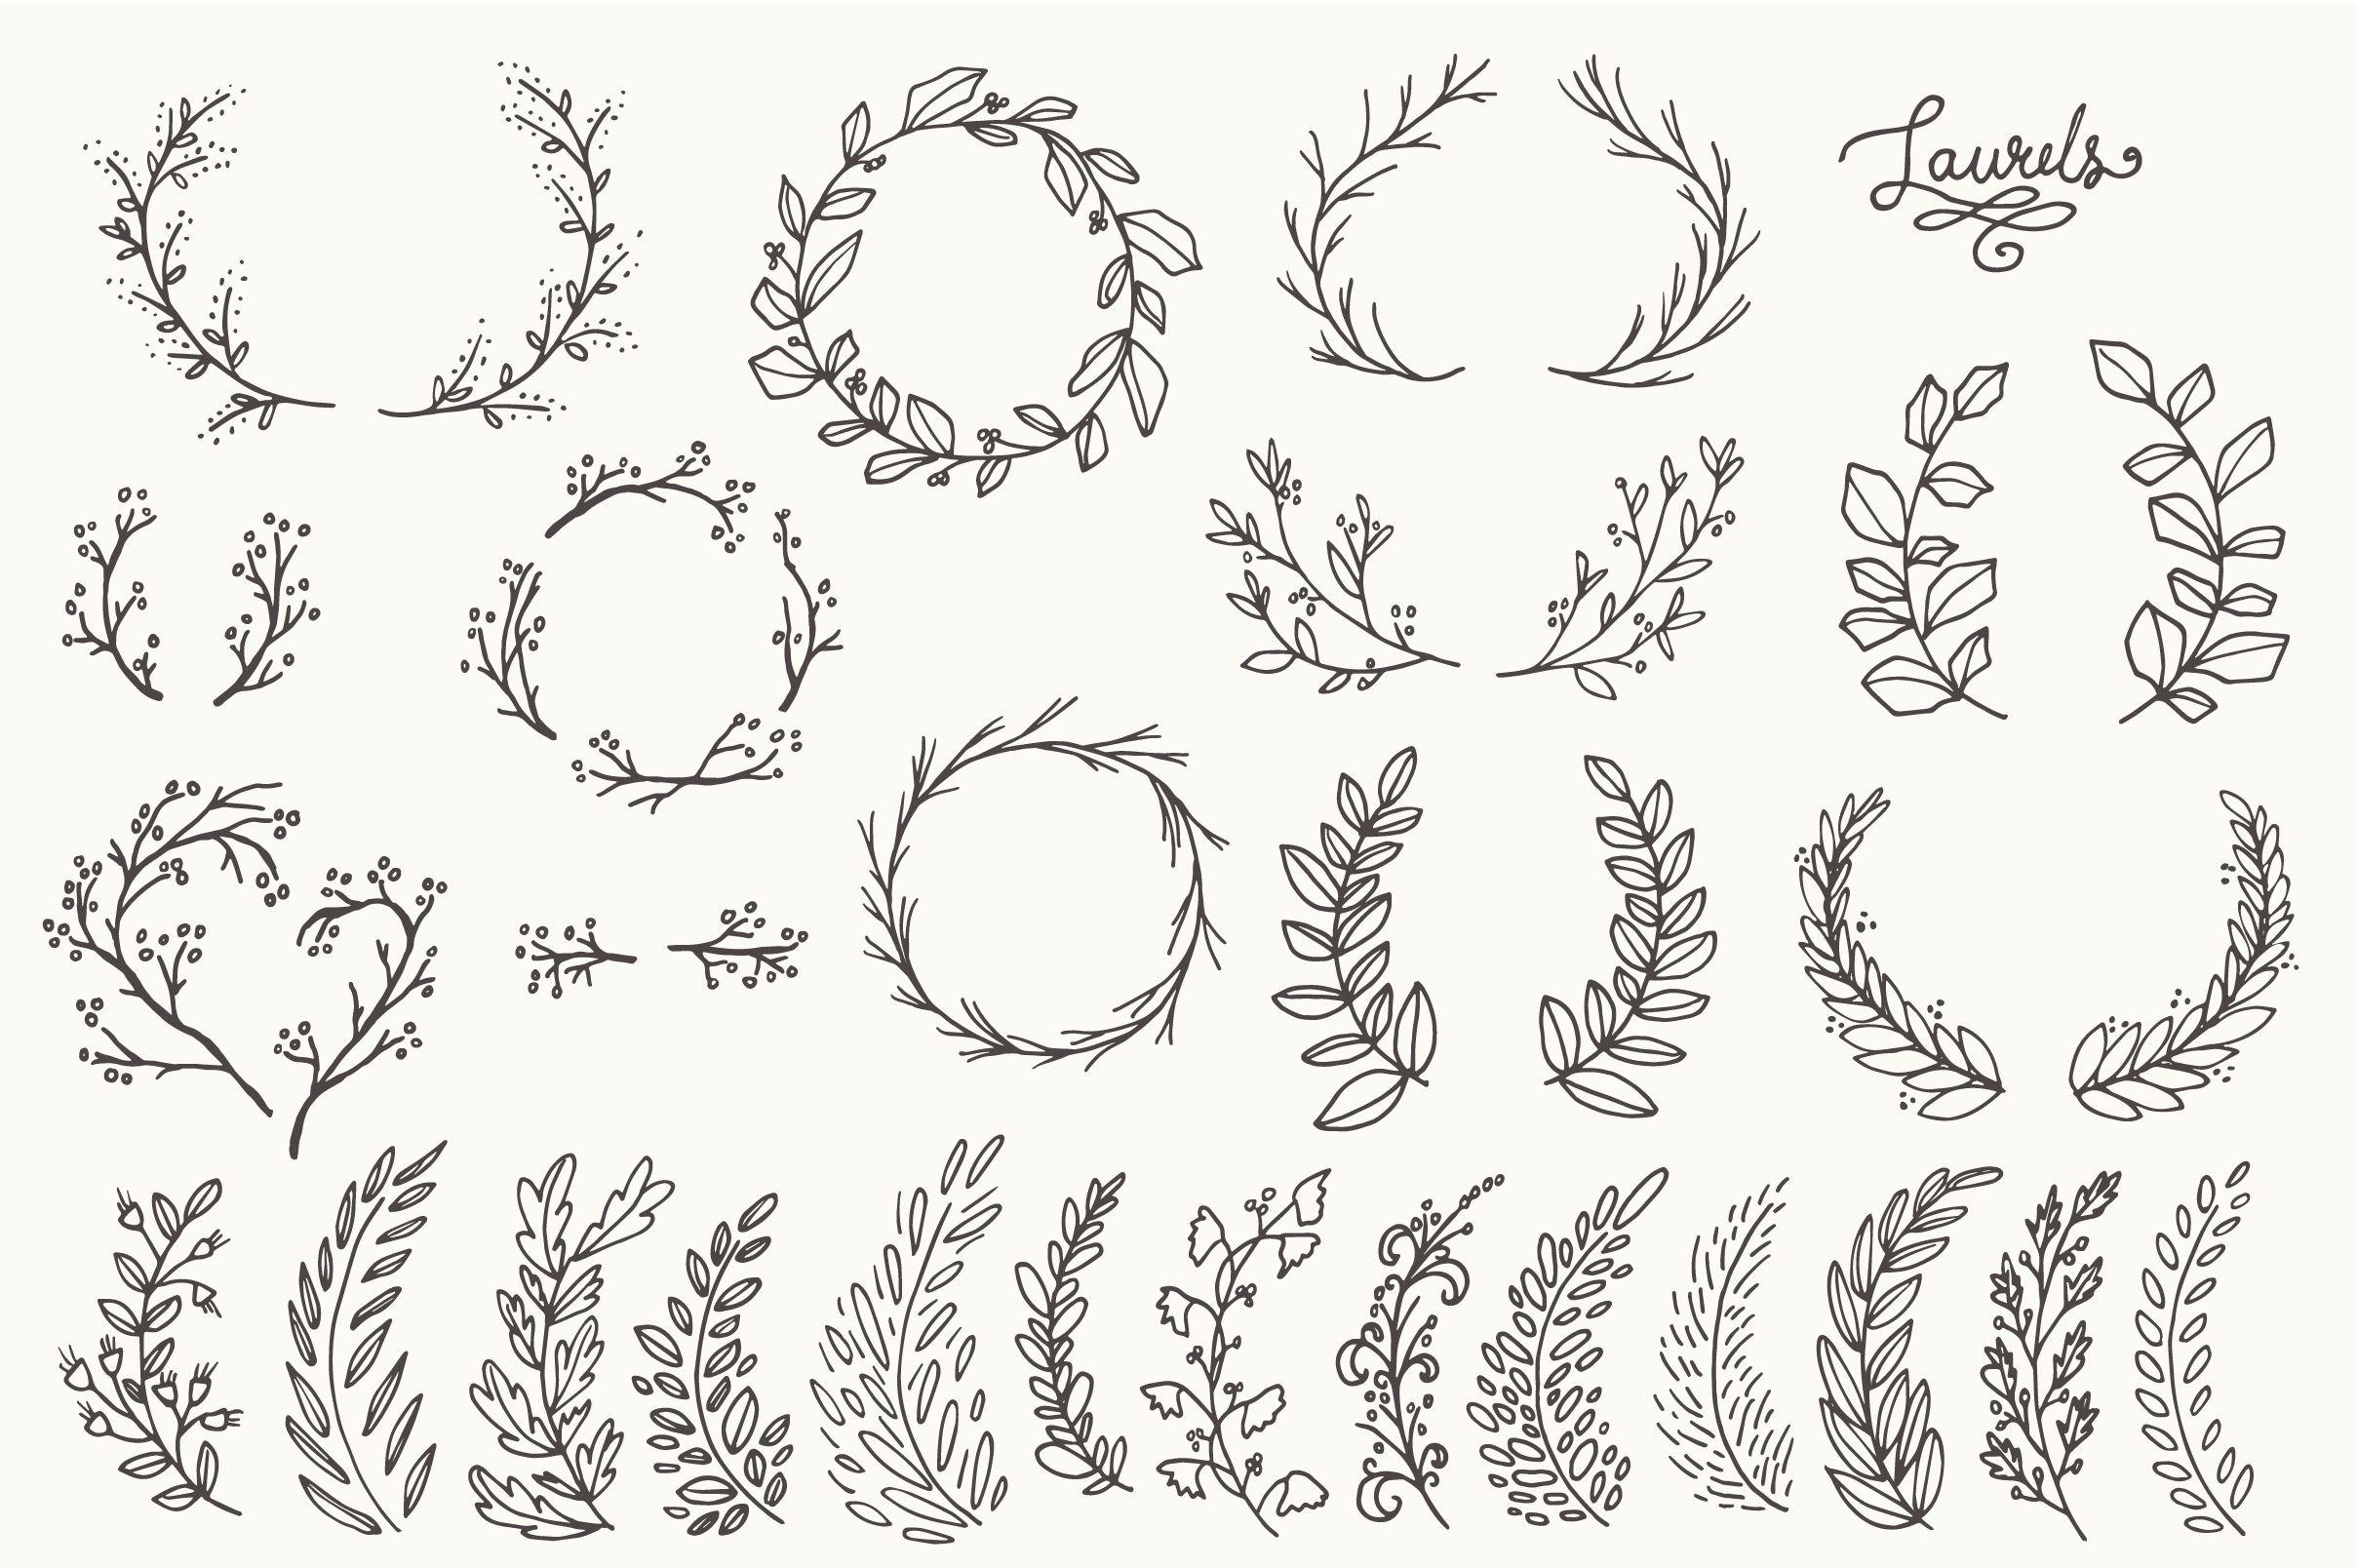 Whimsical Laurels Amp Wreaths Clip Art By The Pen Amp Brush On